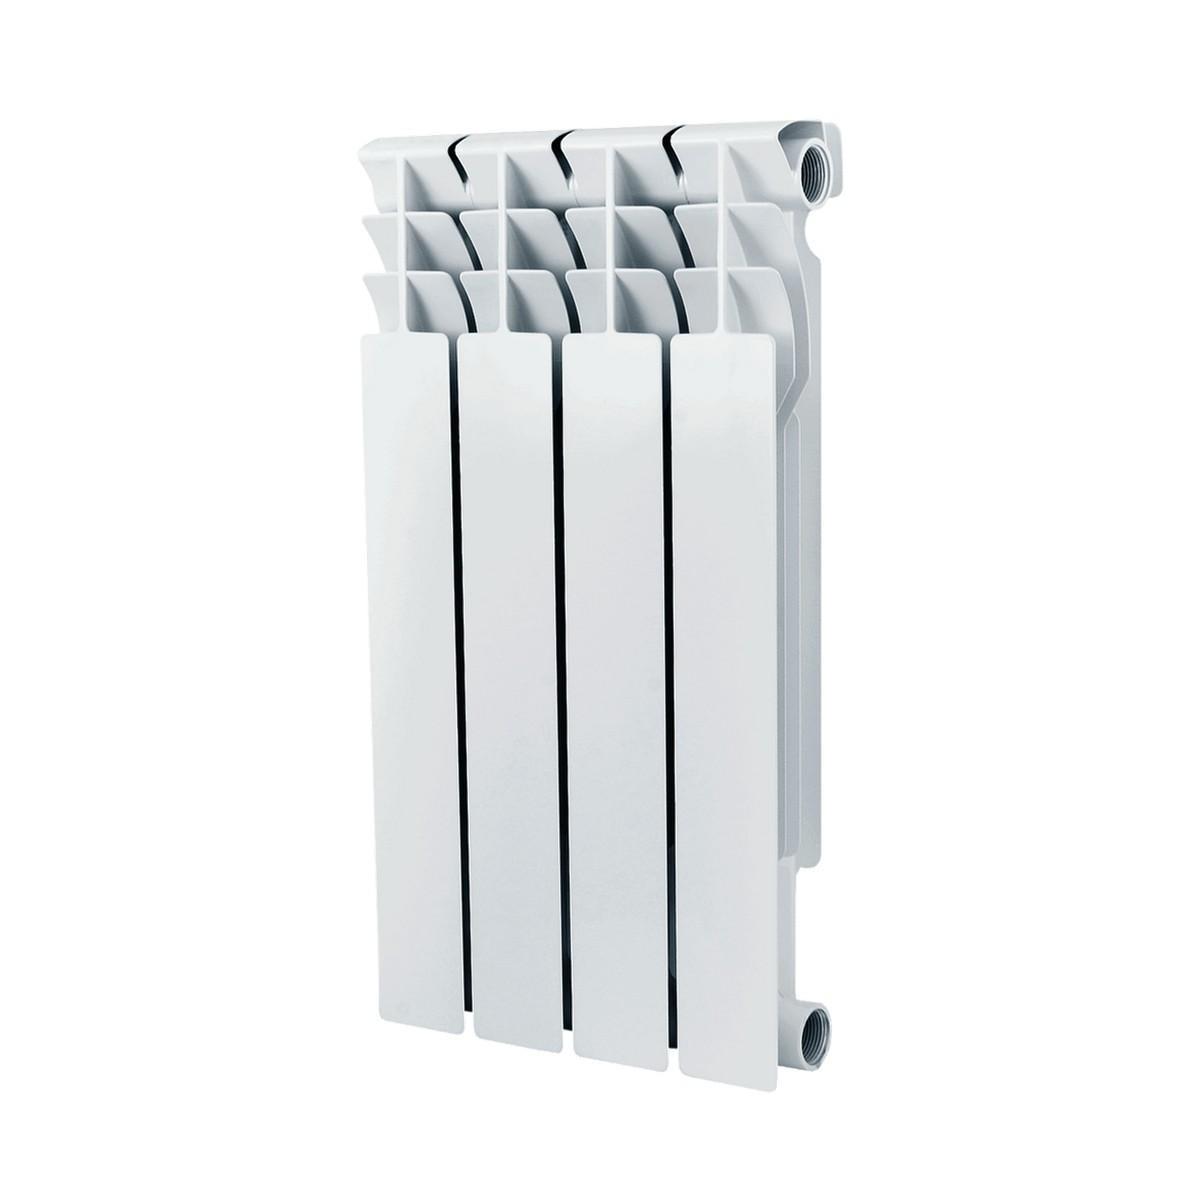 Радиатор биметалл Ultra Plus 500 9 секций Ogint  117-5977